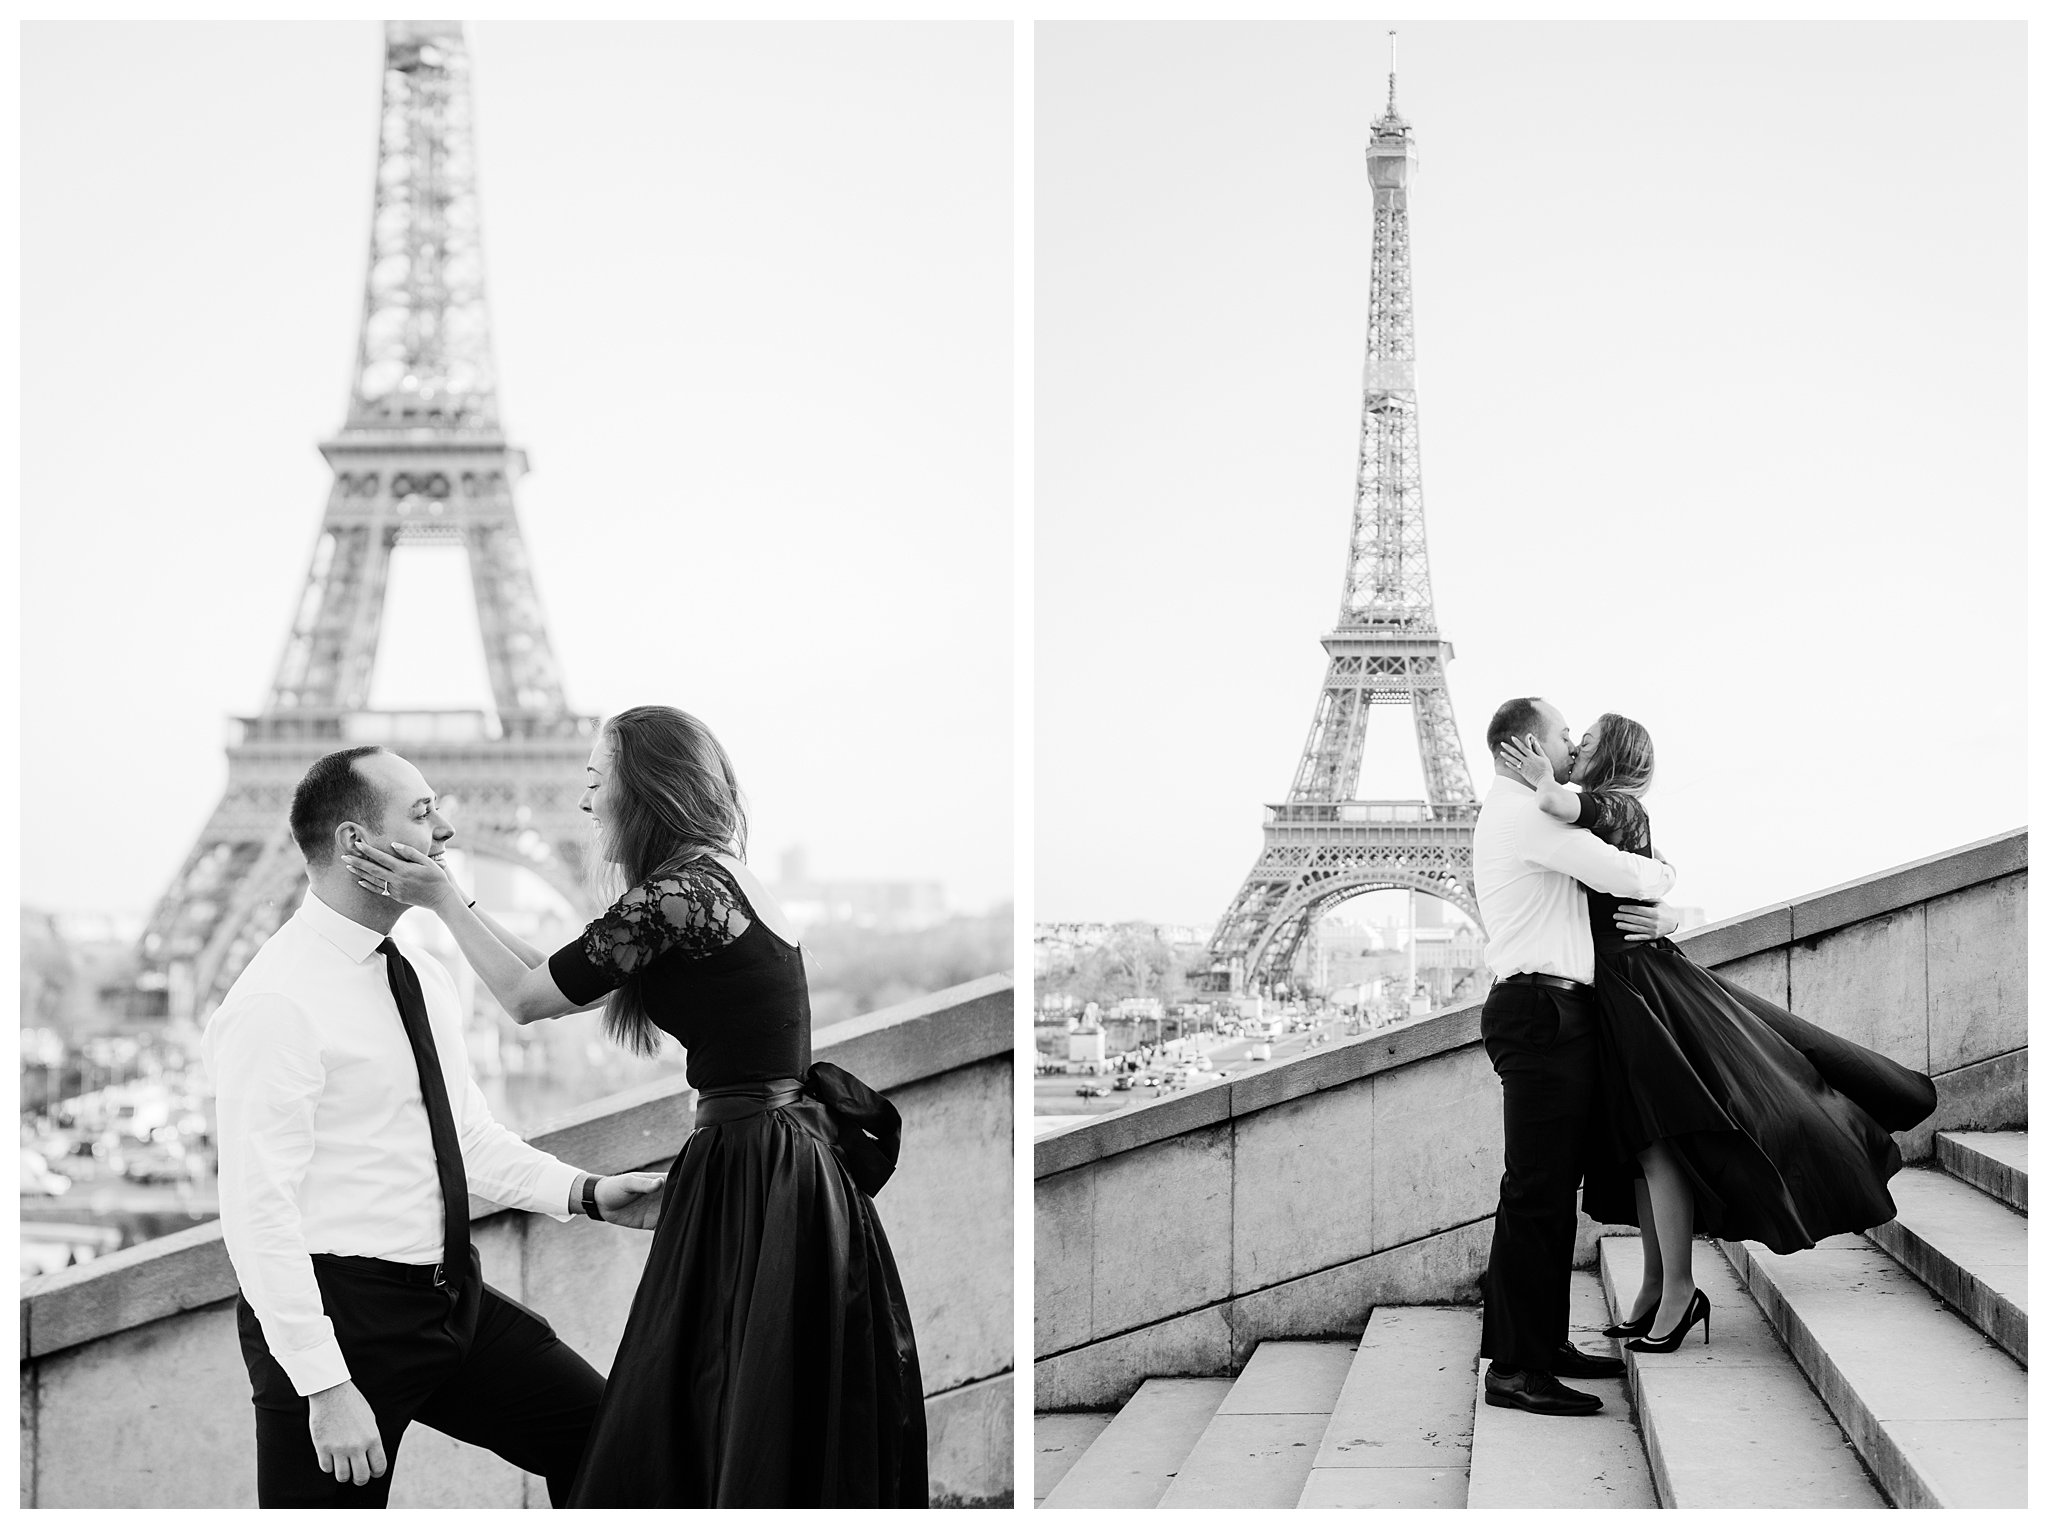 Jennifer and Yannick's Surprise Paris Proposal Photo Shoot at the Eiffel Tower - the kiss bw